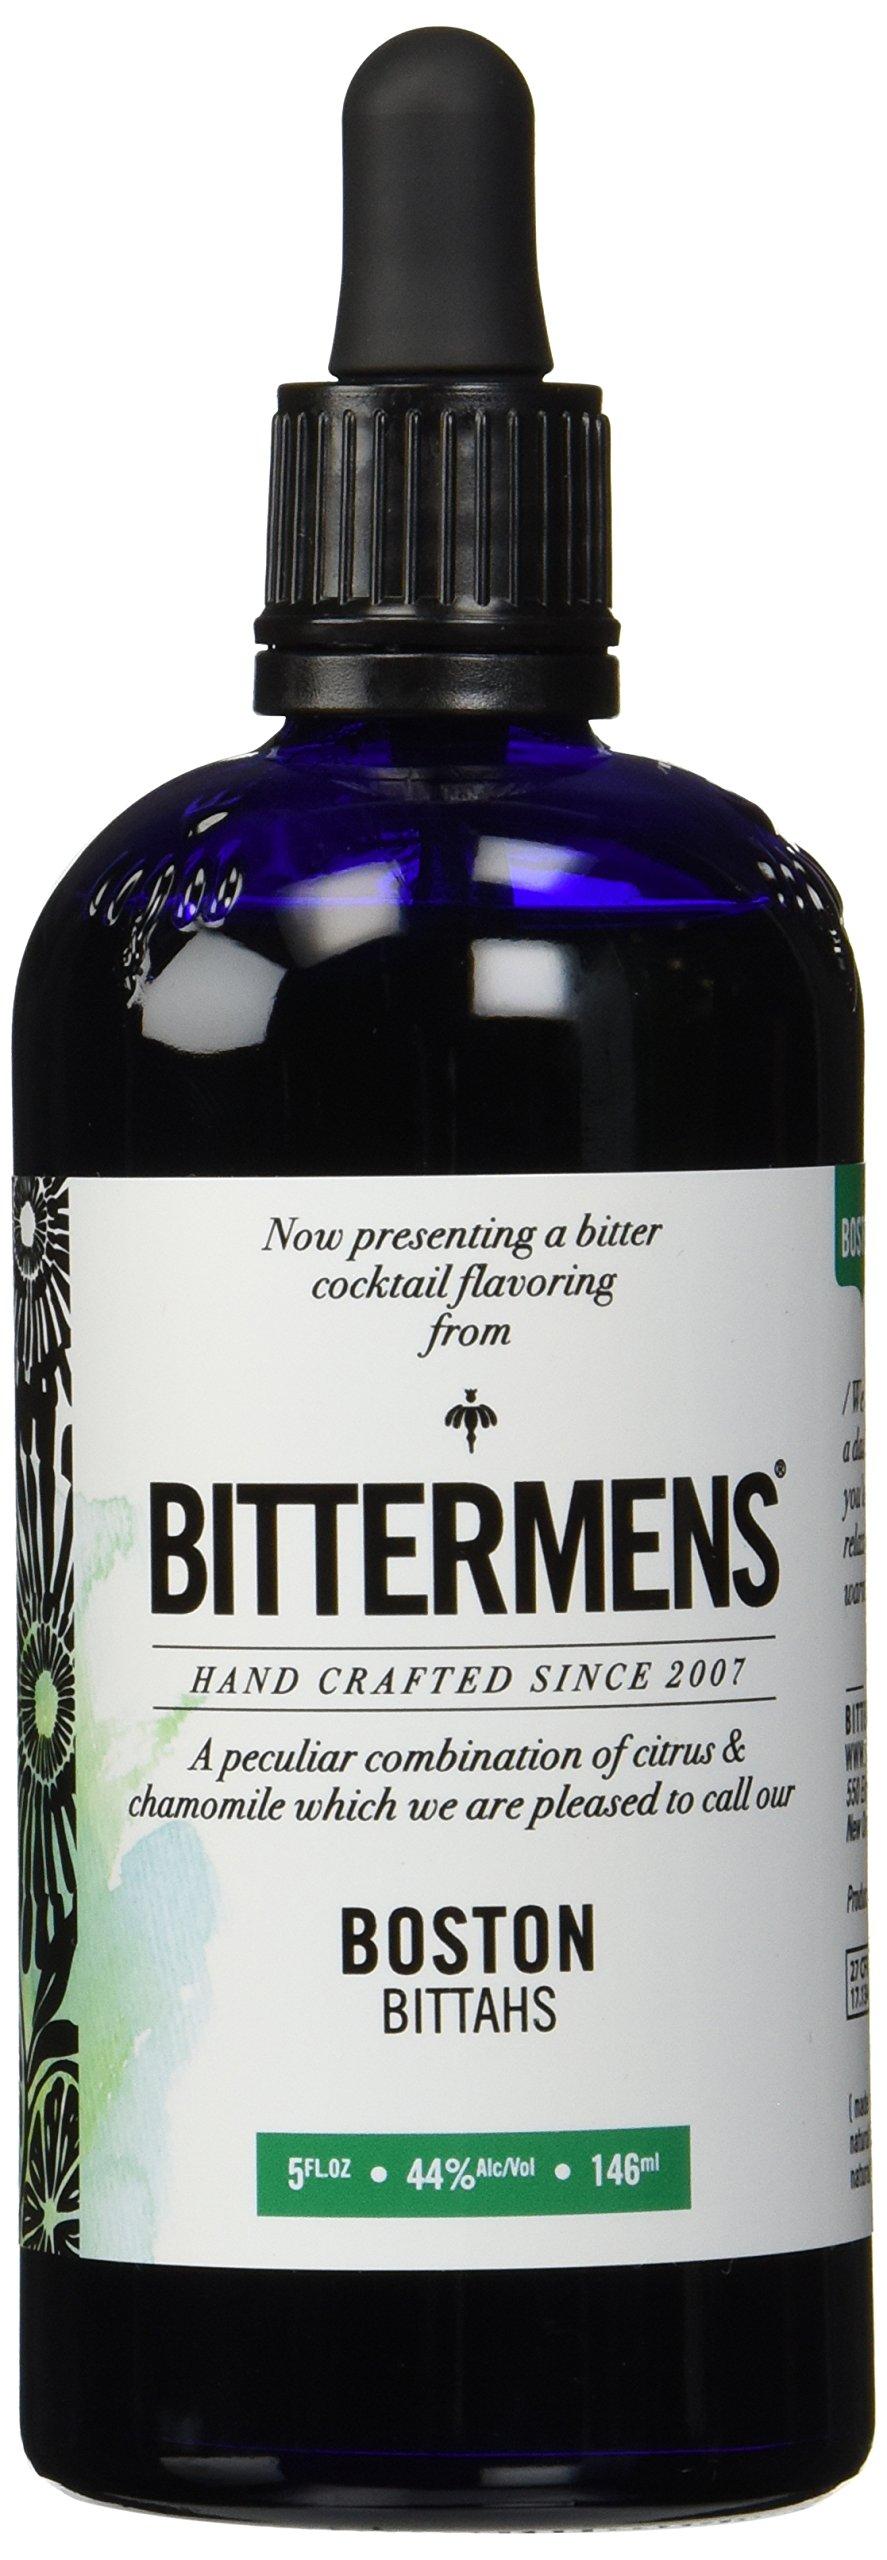 BITTERMENS BOSTON BITTAHS Bitter aromatizzante 146 ml